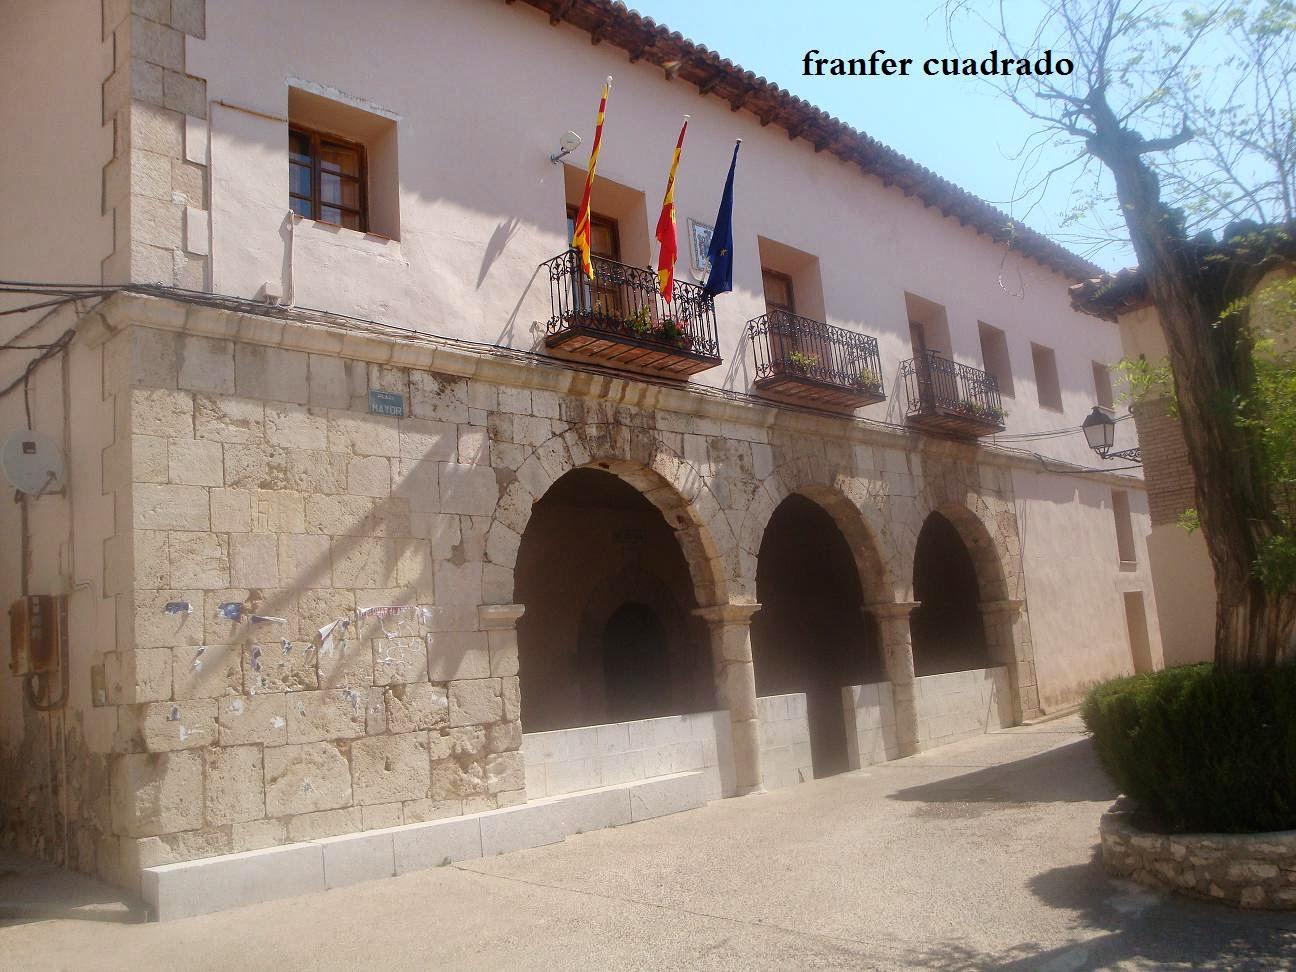 PALOMAR DE ARROYOS